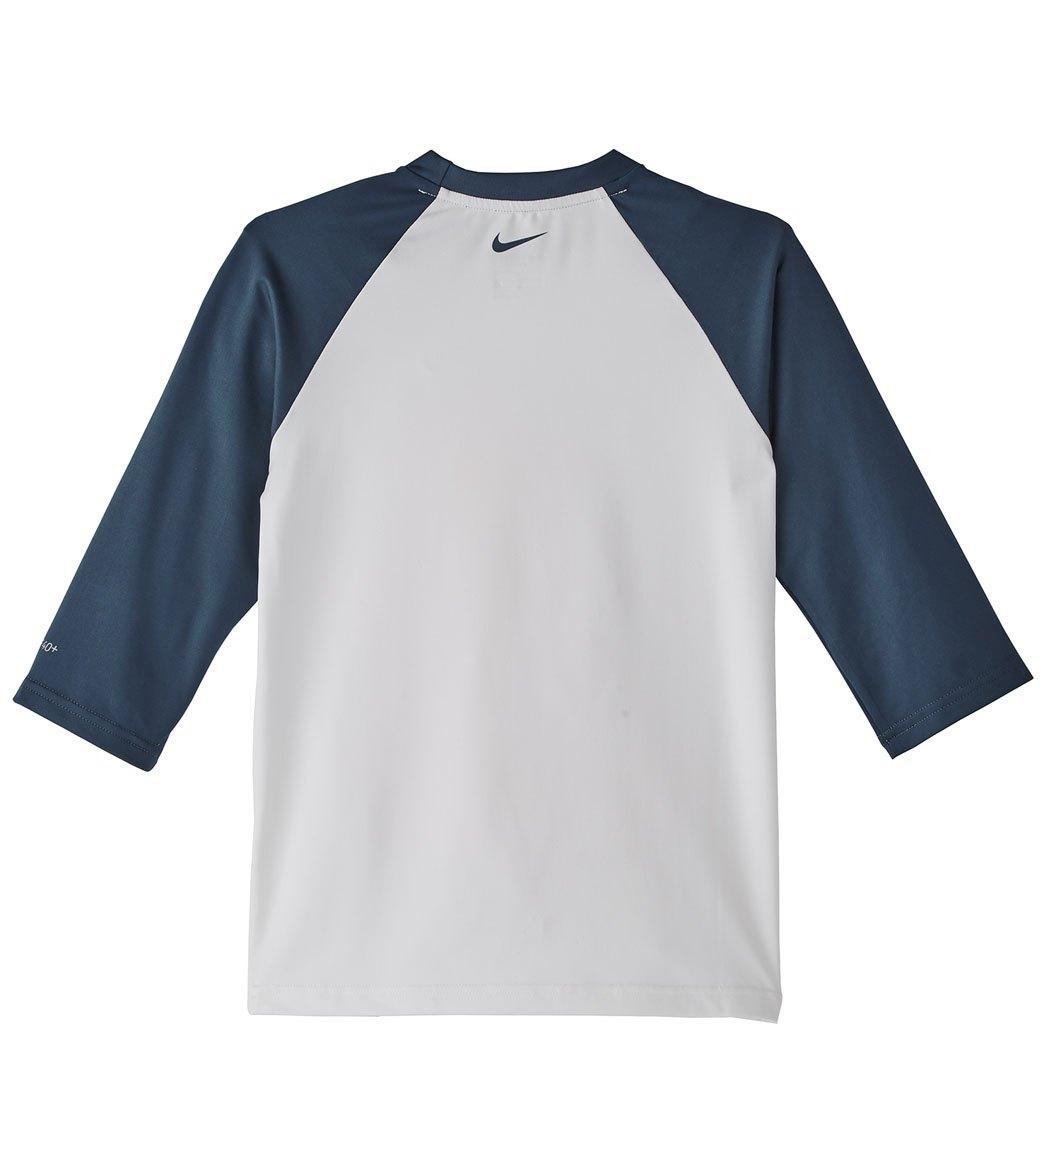 ef2e729e48 Nike Girls' Rift 3/4 Sleeve Hydroguard Rash Guard (Big Kid) at ...